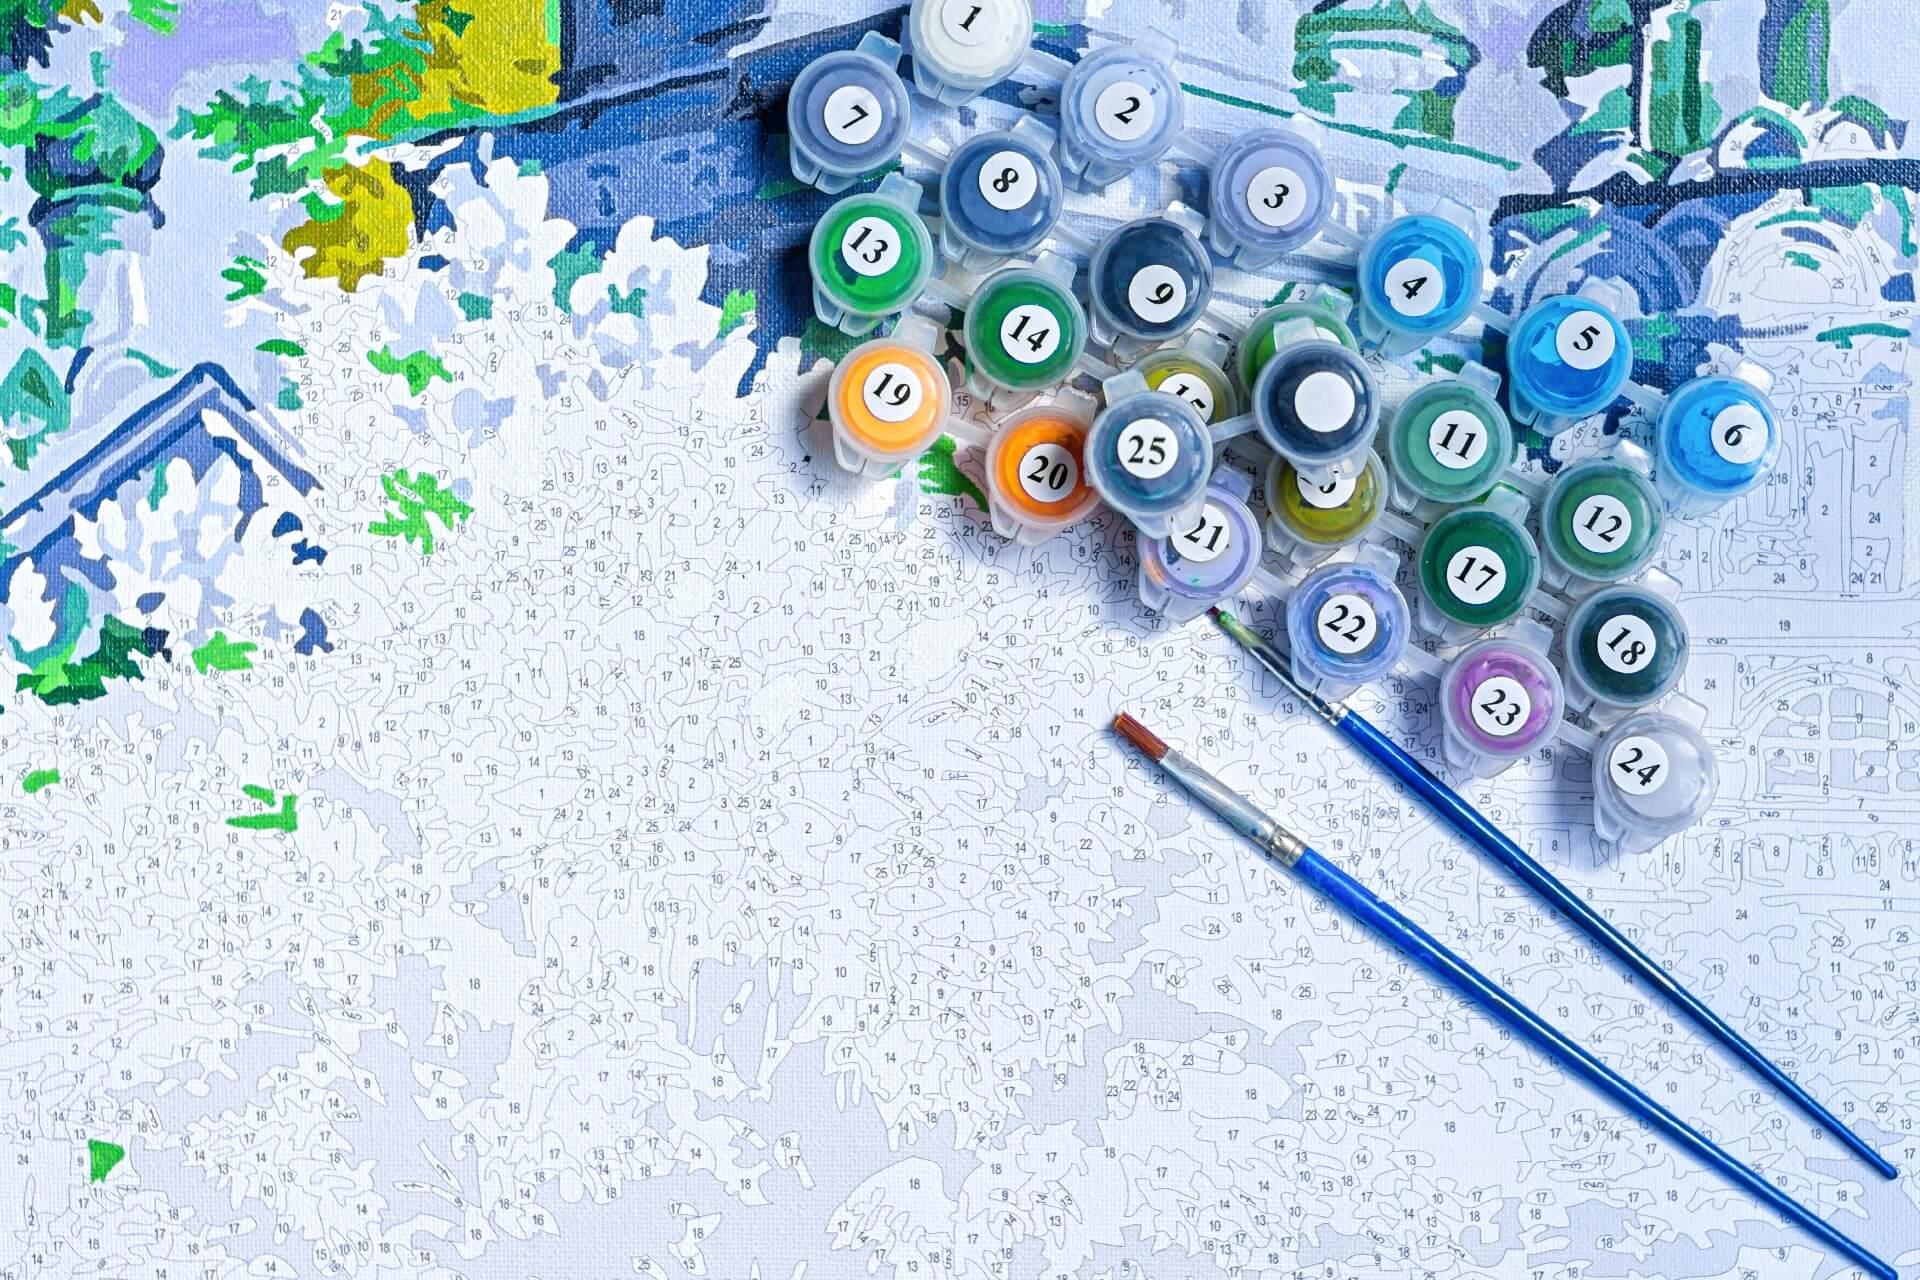 Kit De Pintura Por Números